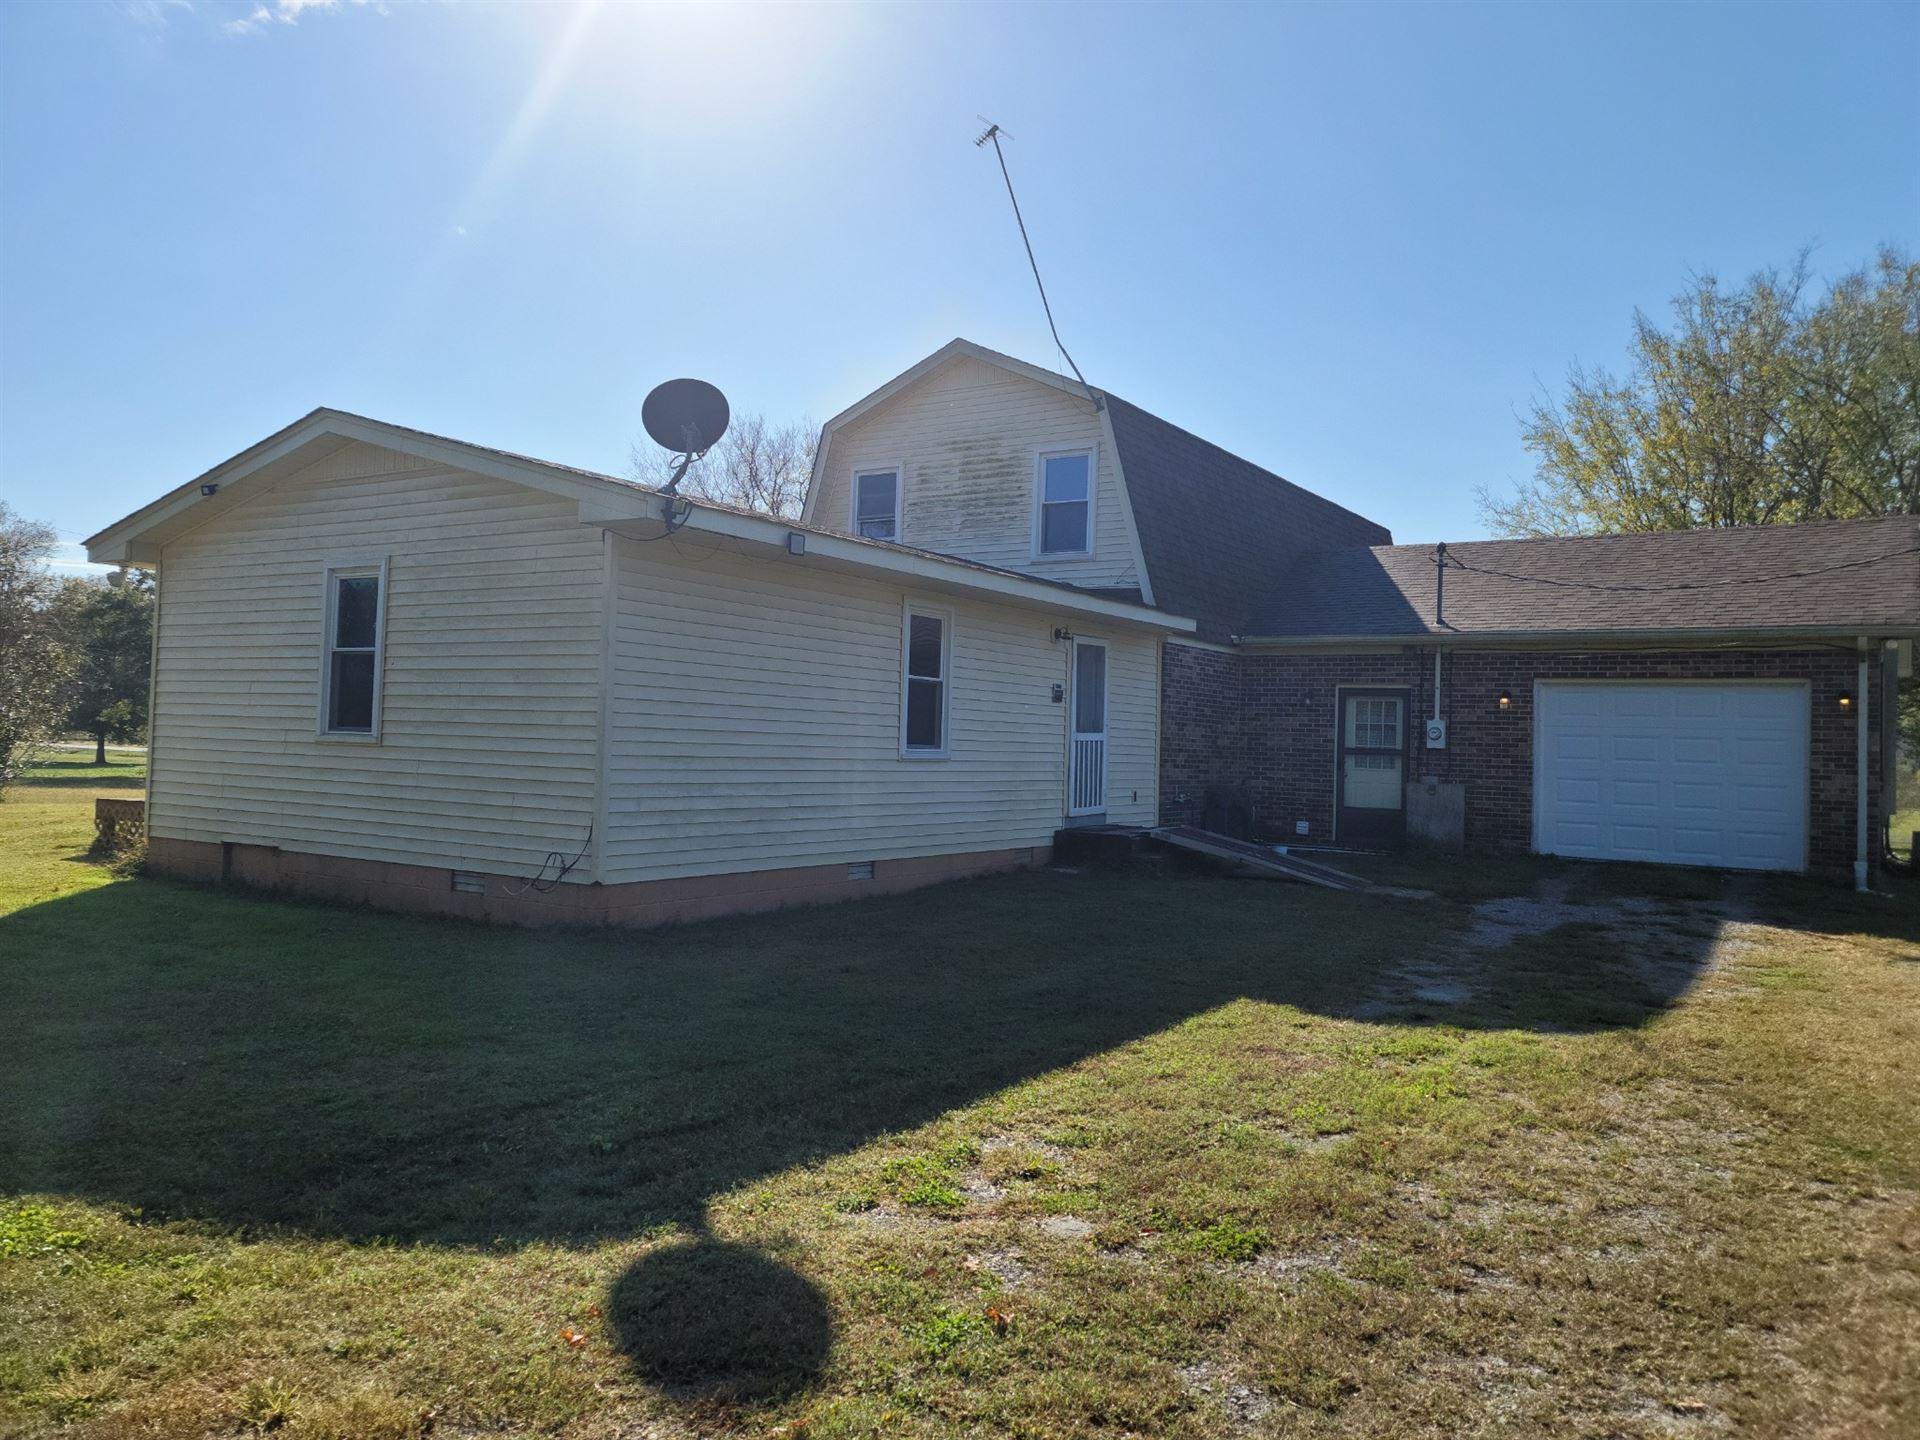 Photo of 4363 Elkton Pike, Prospect, TN 38477 (MLS # 2200213)